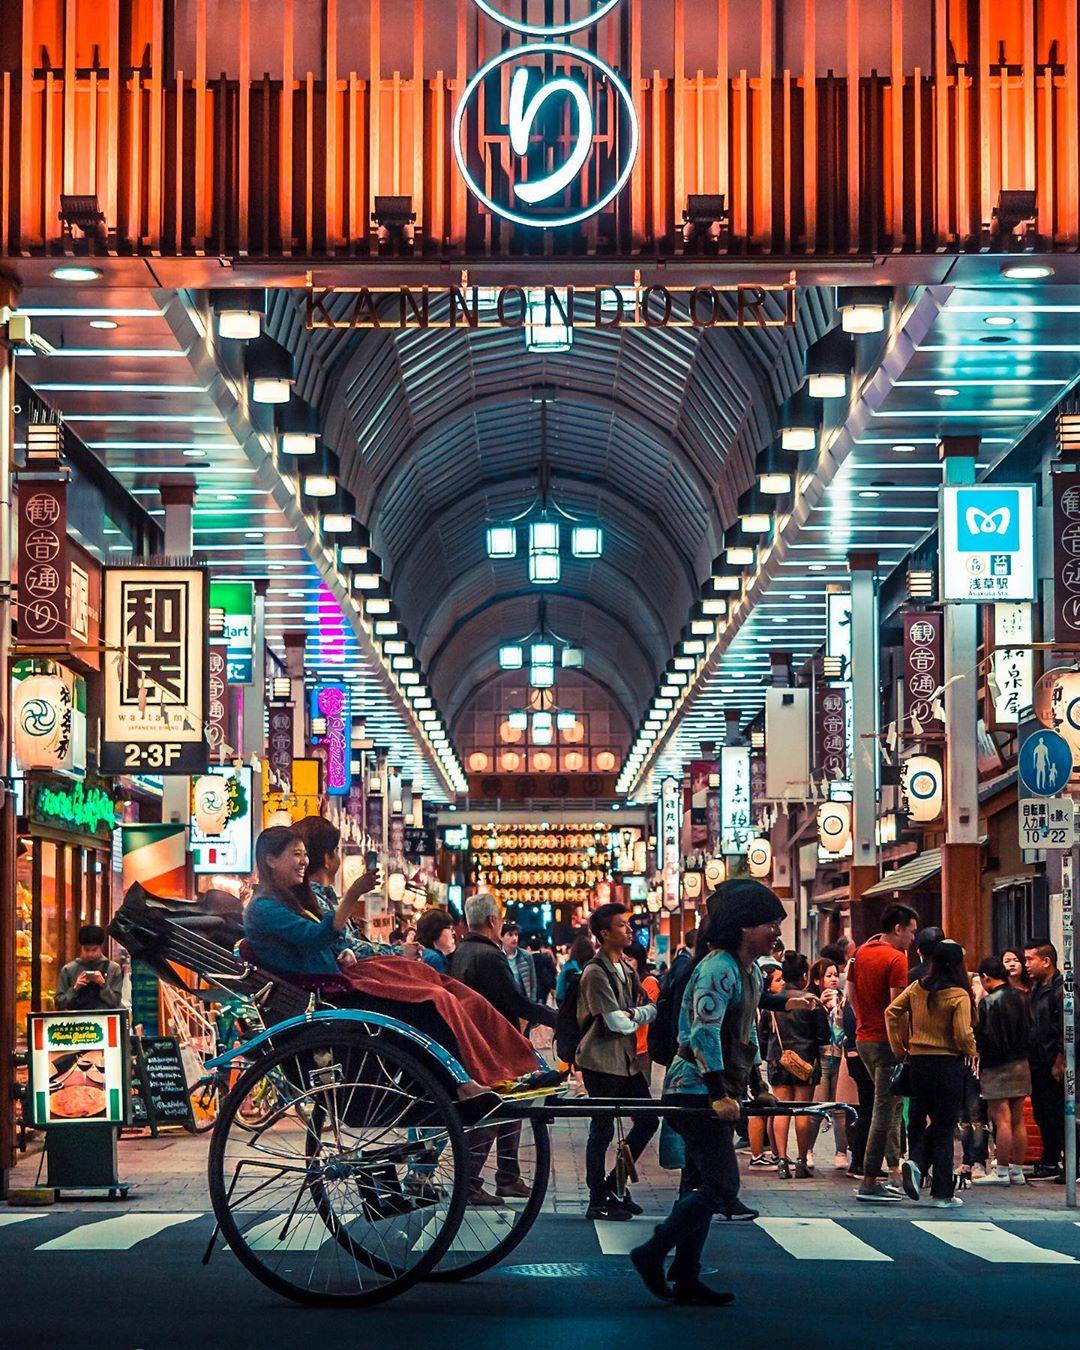 tokyo-nightlife-photography-hosokawa-ryohei-10